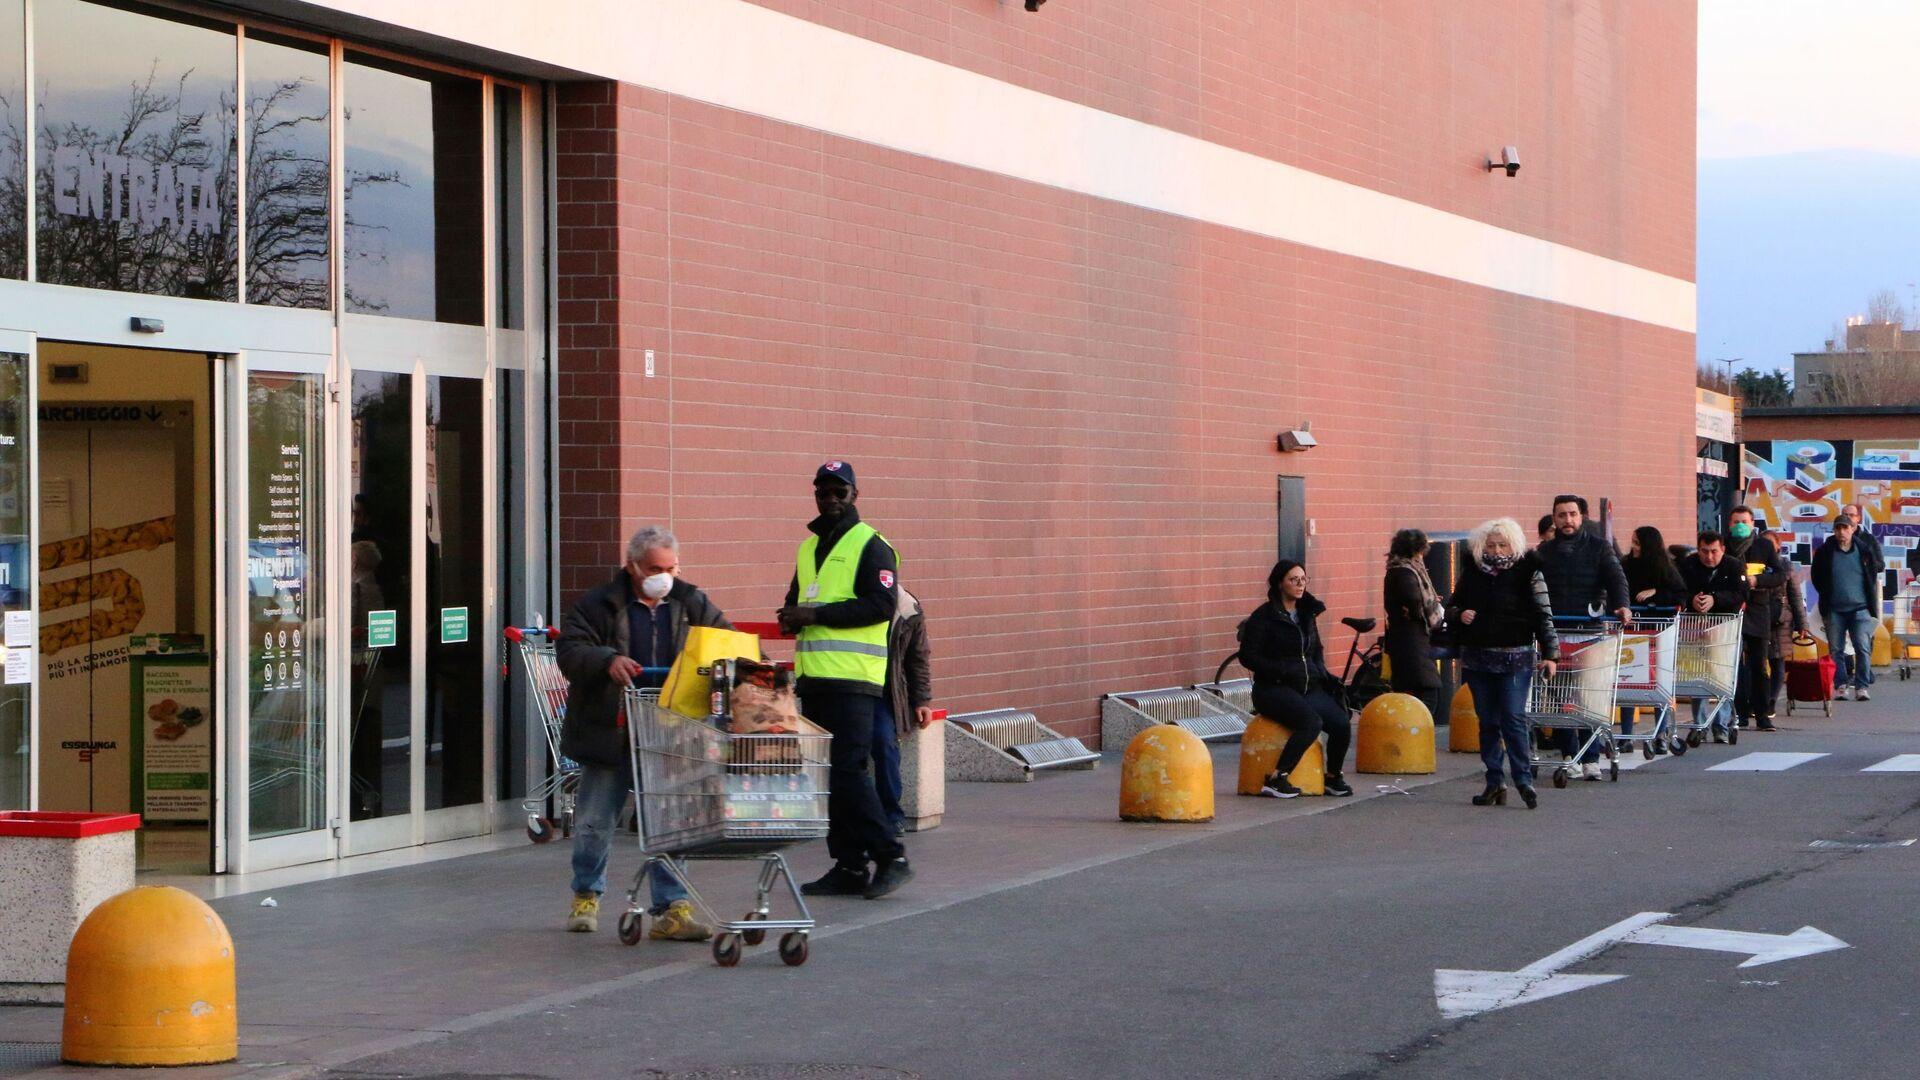 La coda al supermercato - Sputnik Italia, 1920, 12.02.2021